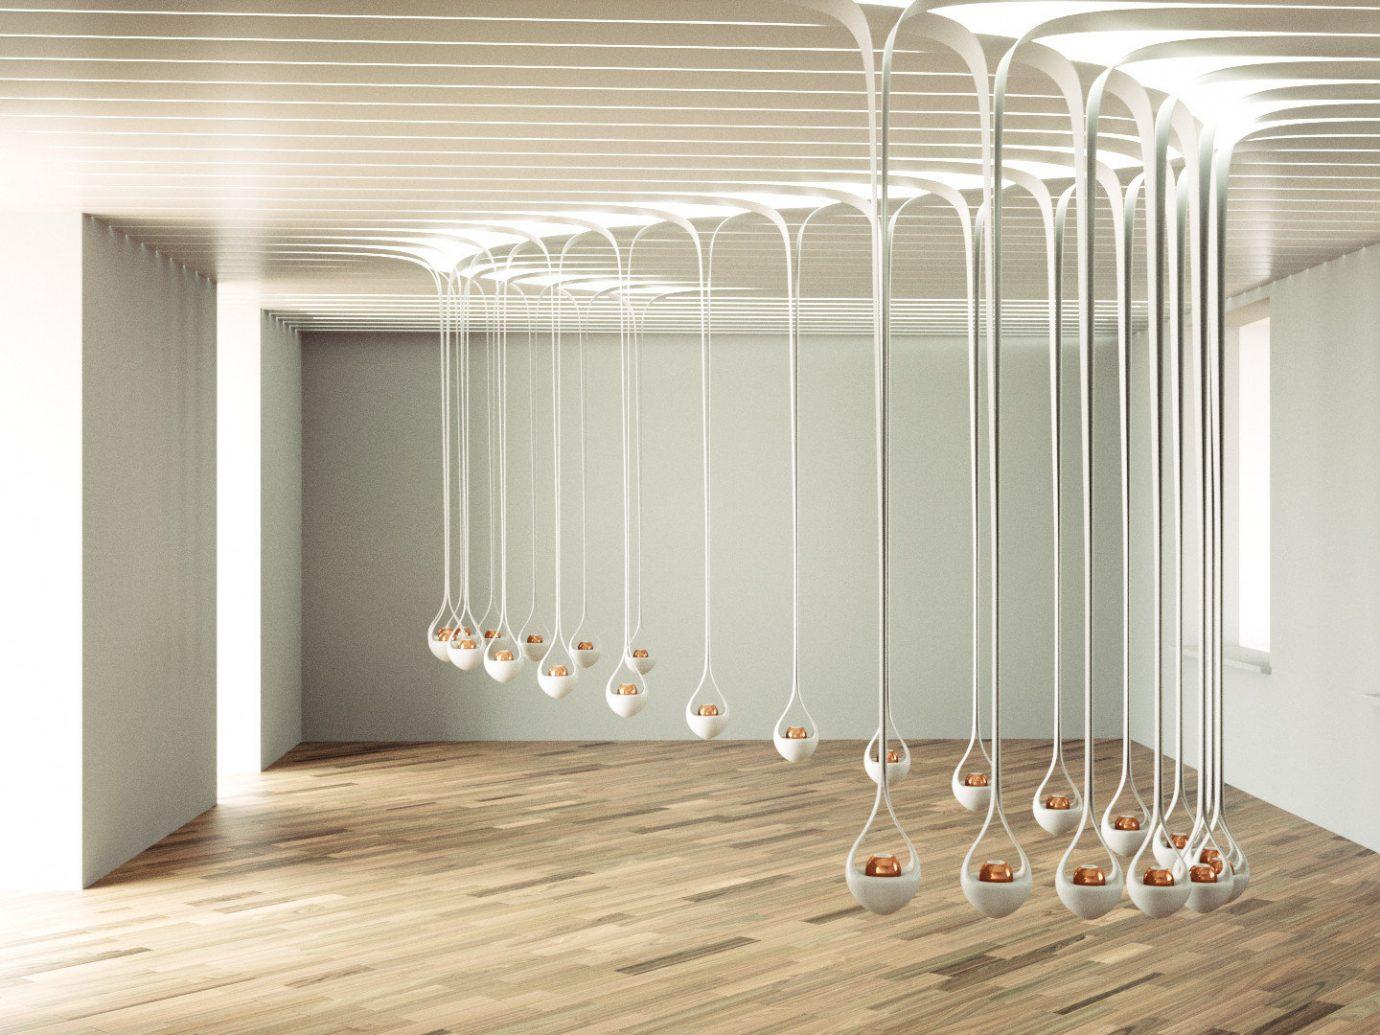 Trip Ideas wall indoor floor room ceiling interior design flooring lighting wood daylighting window covering hall Design furniture